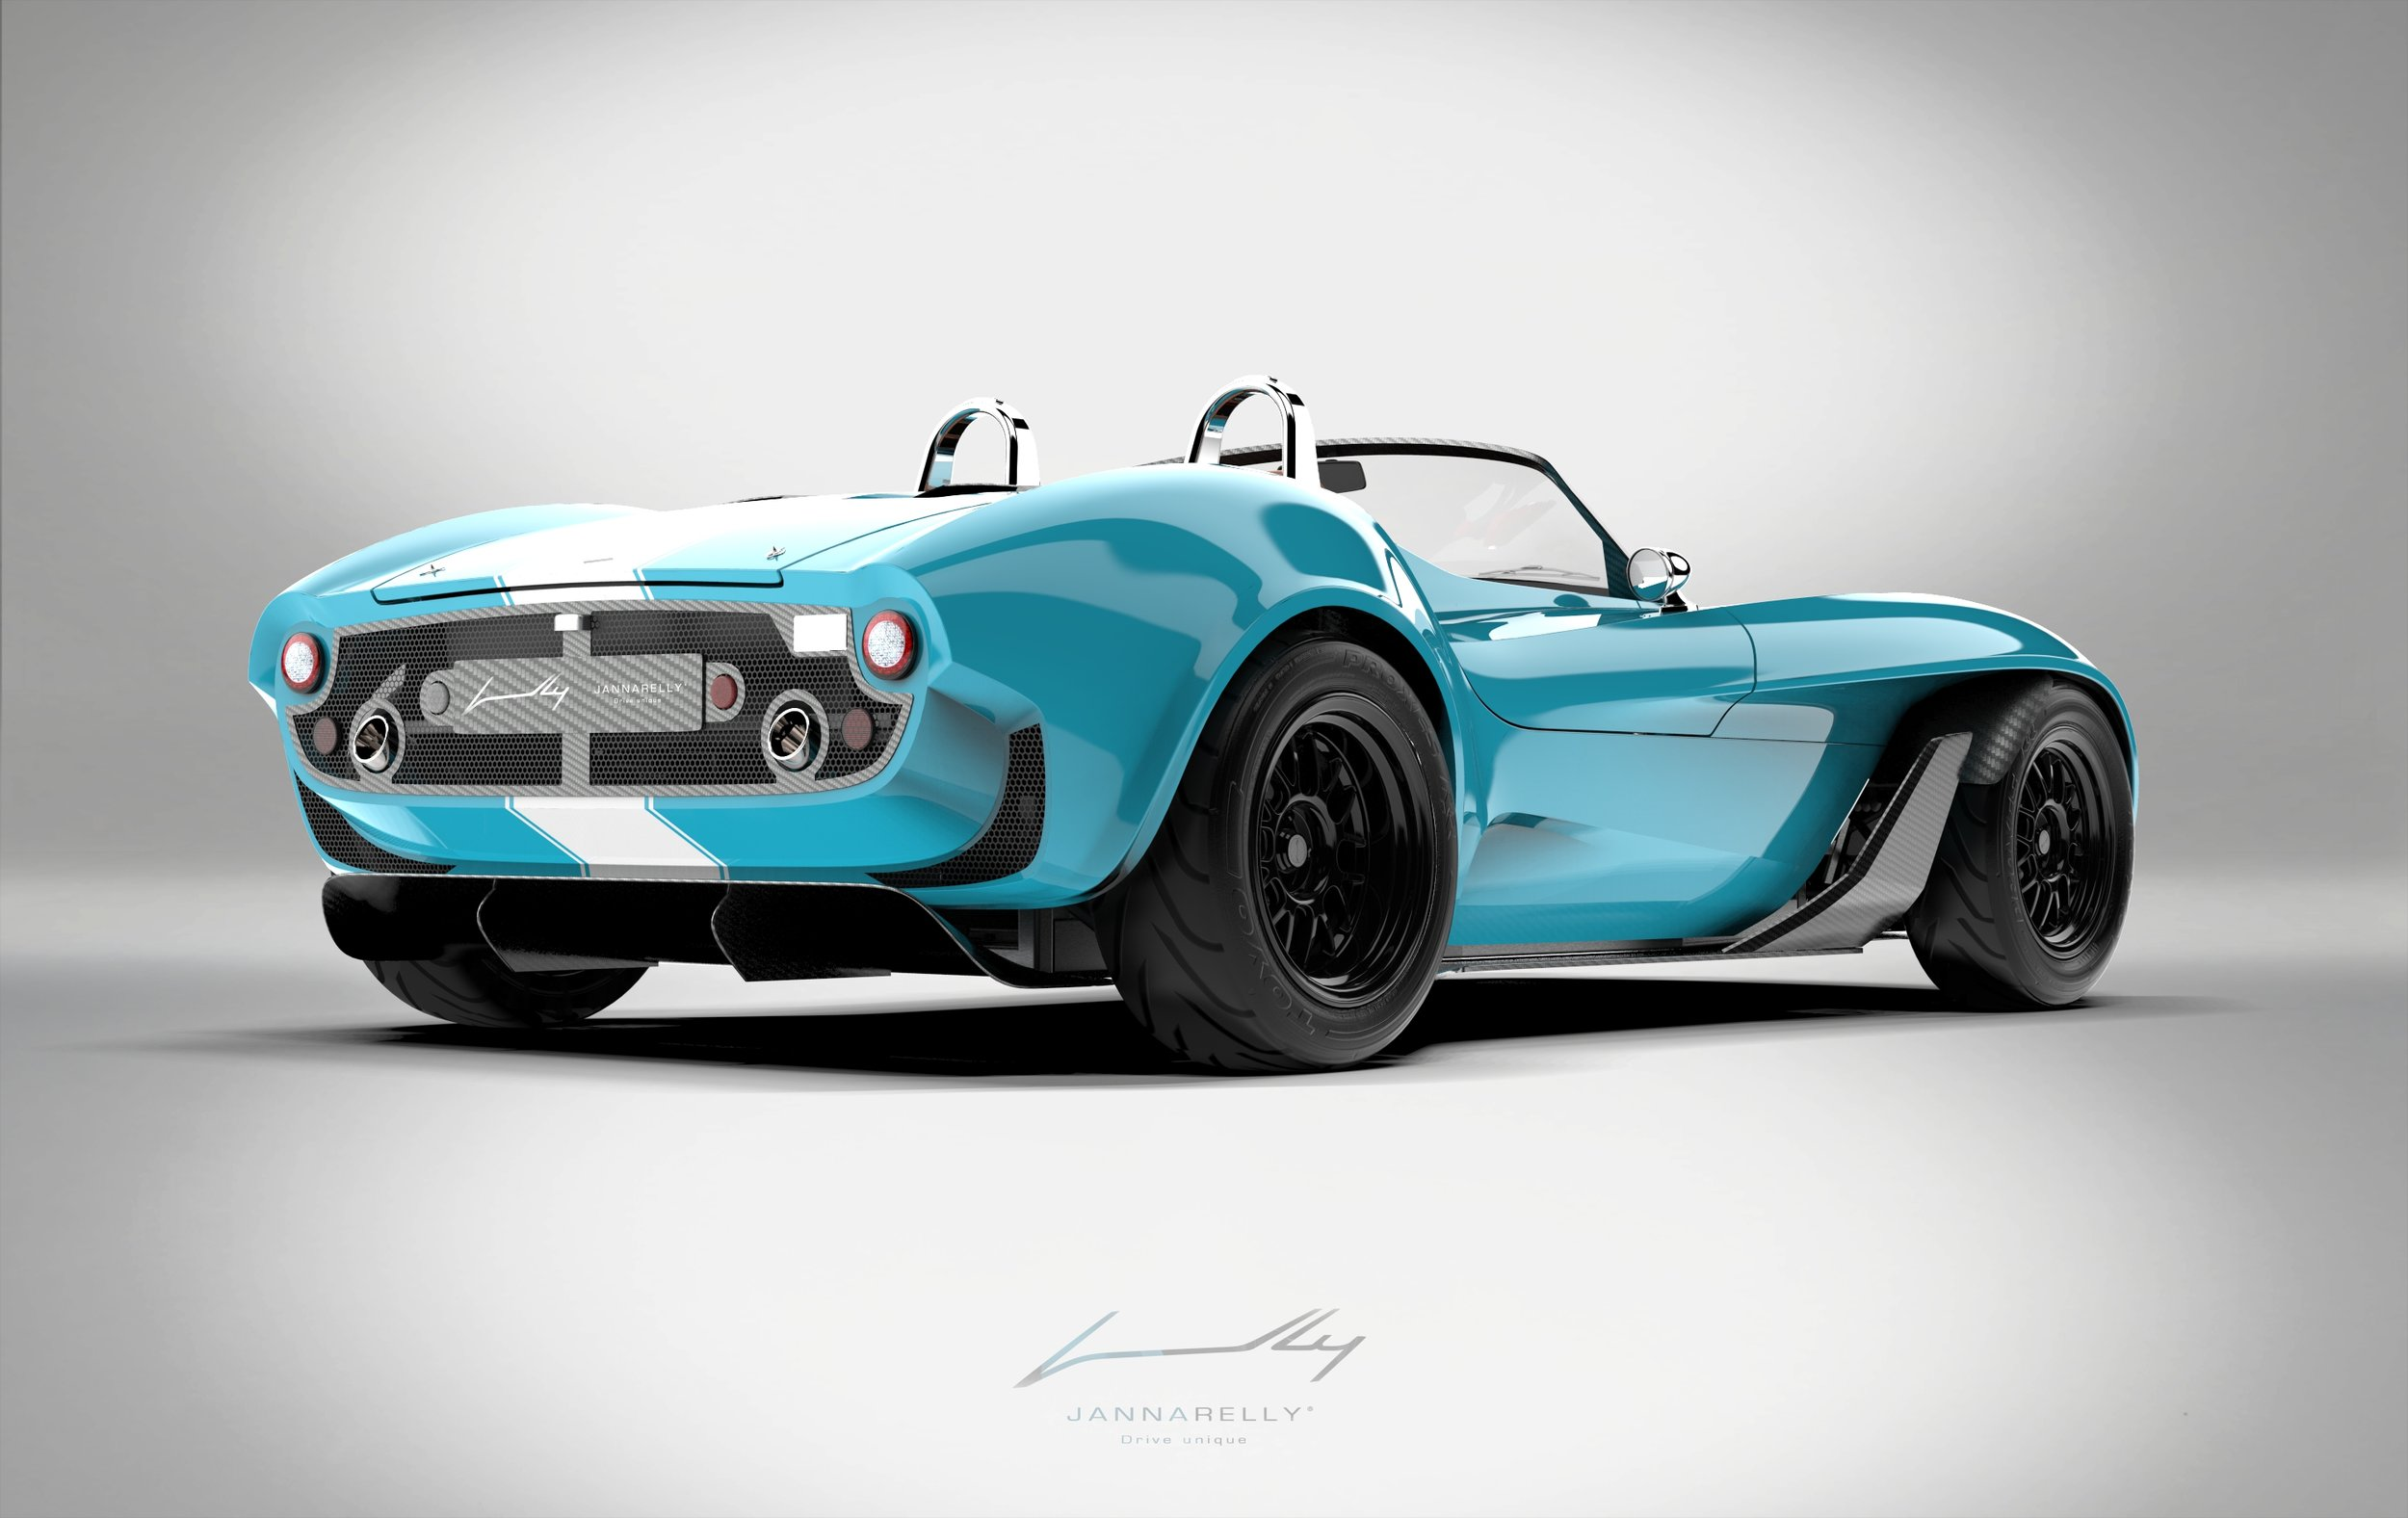 J design1 roadster.319.jpg